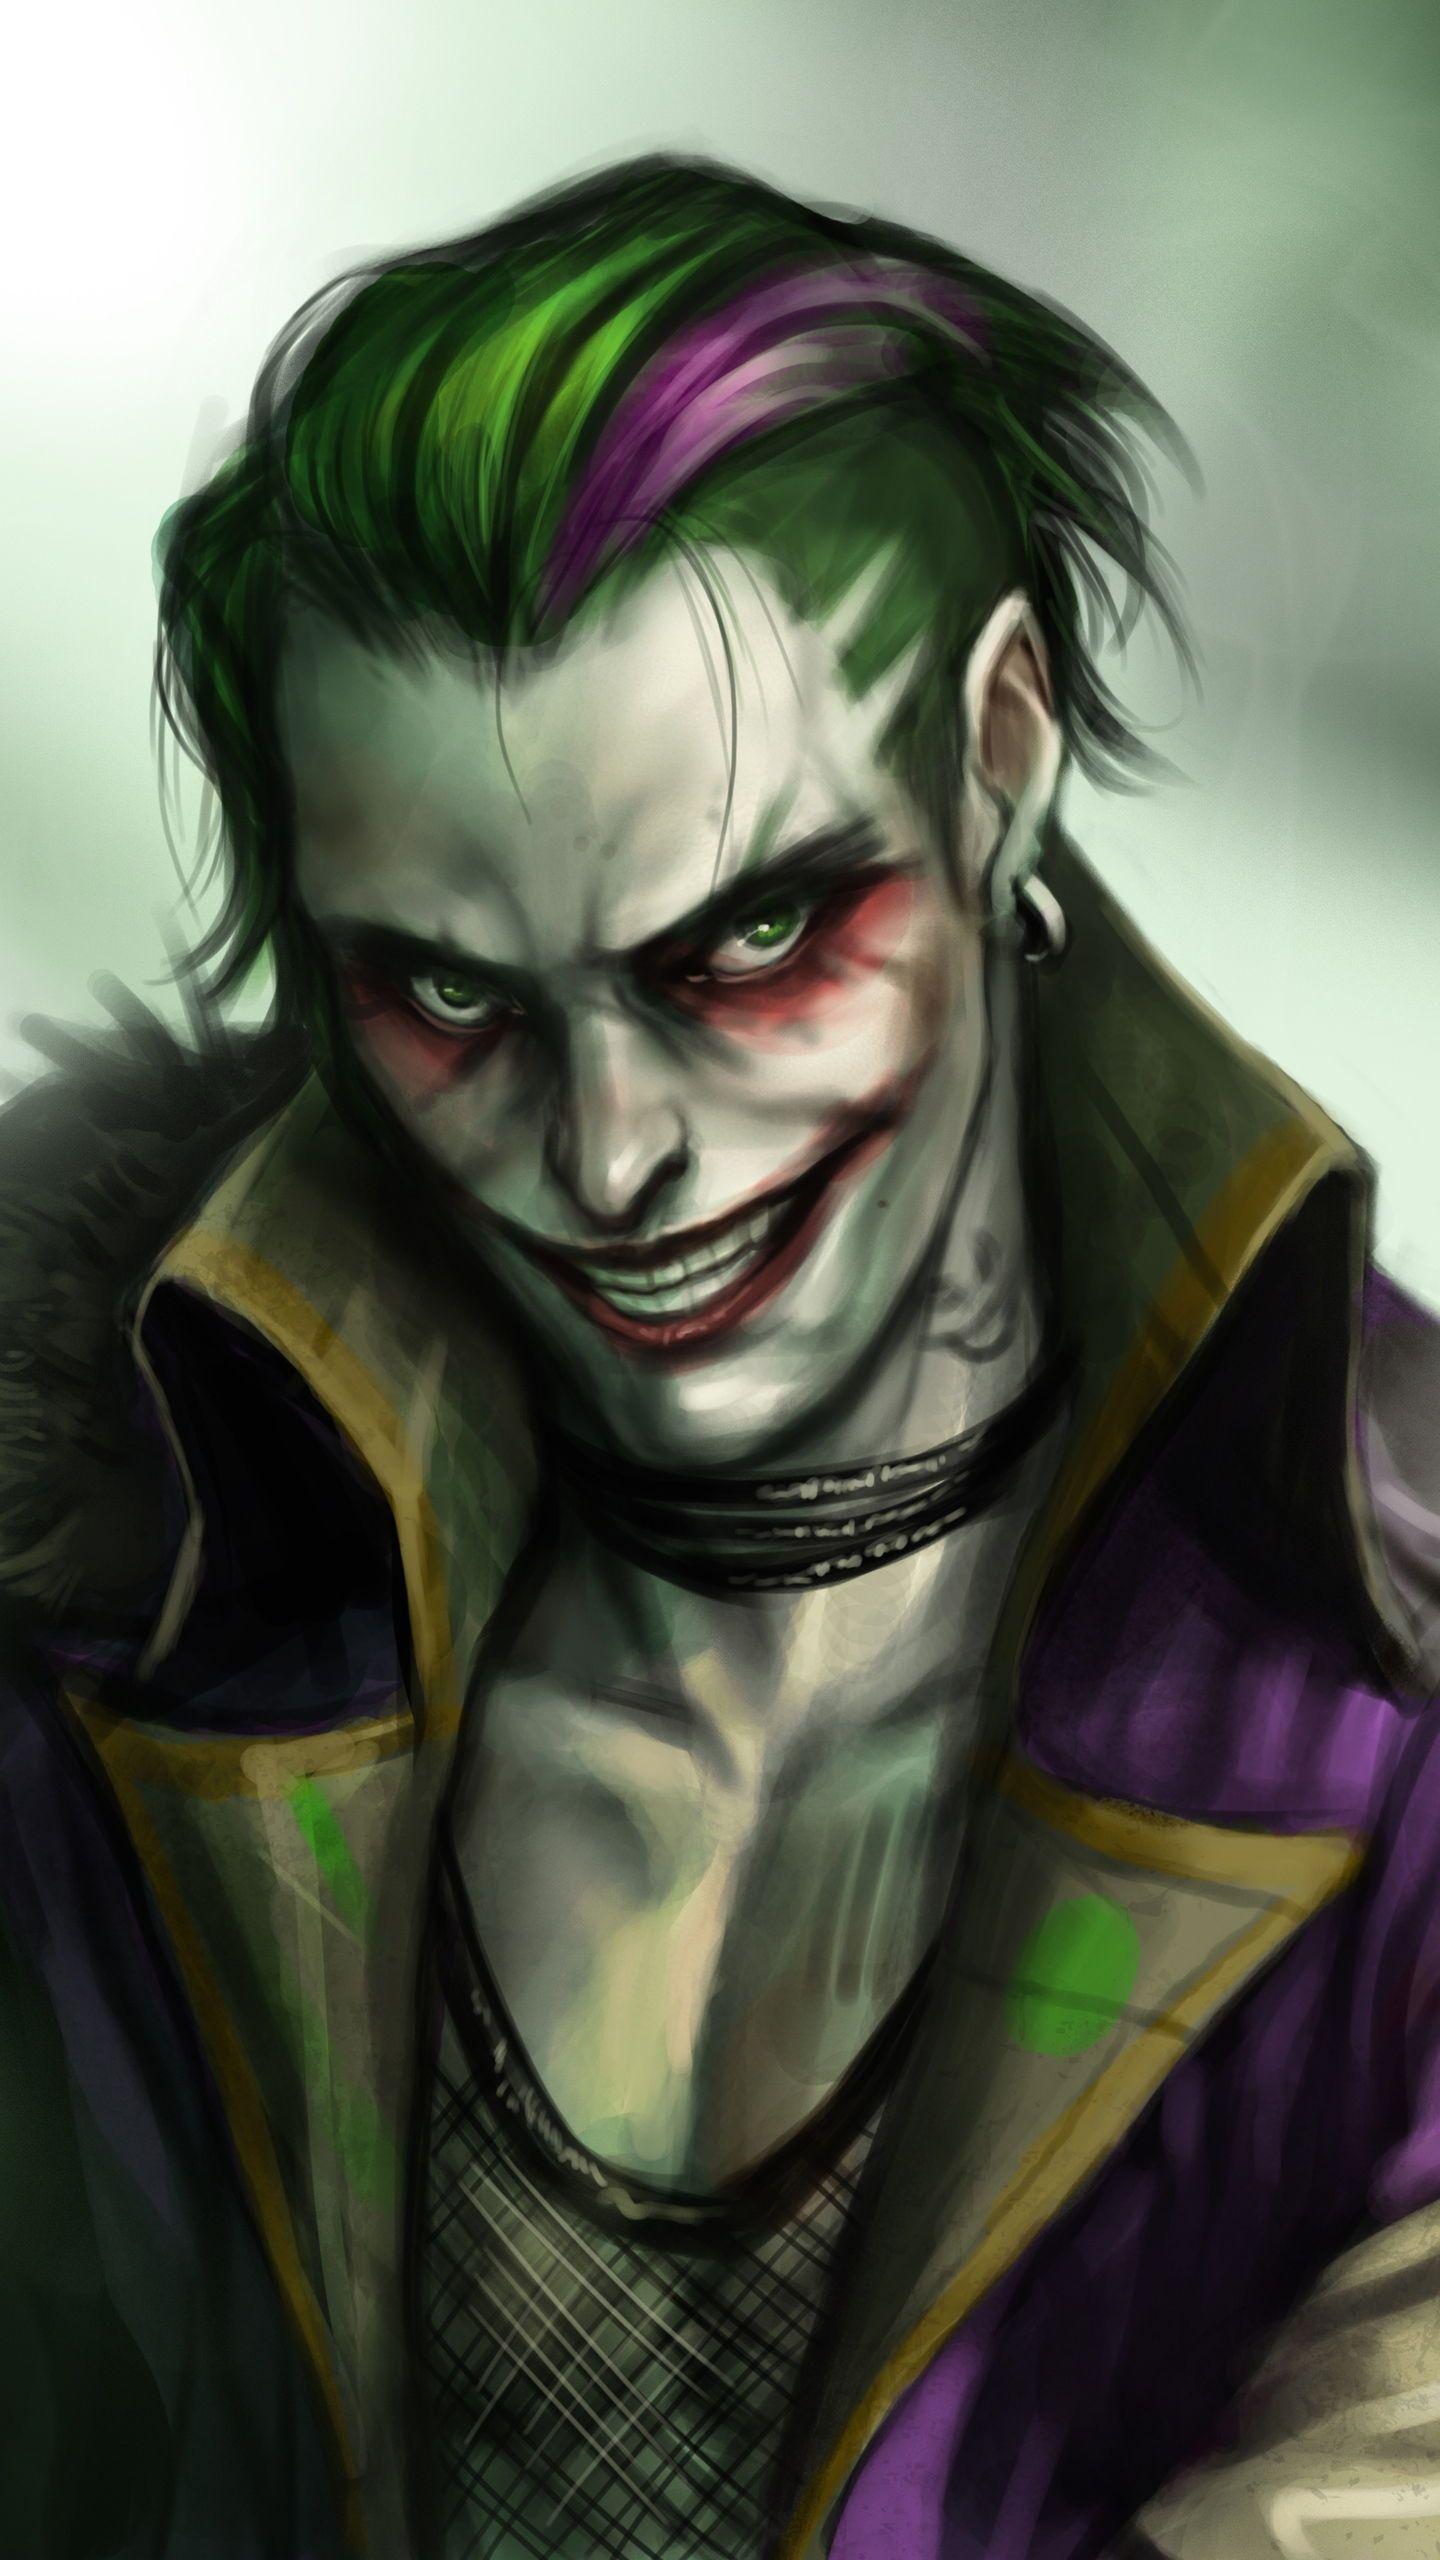 5 Reasons To Watch Joaquin Phoenix's Joker Movie Joker